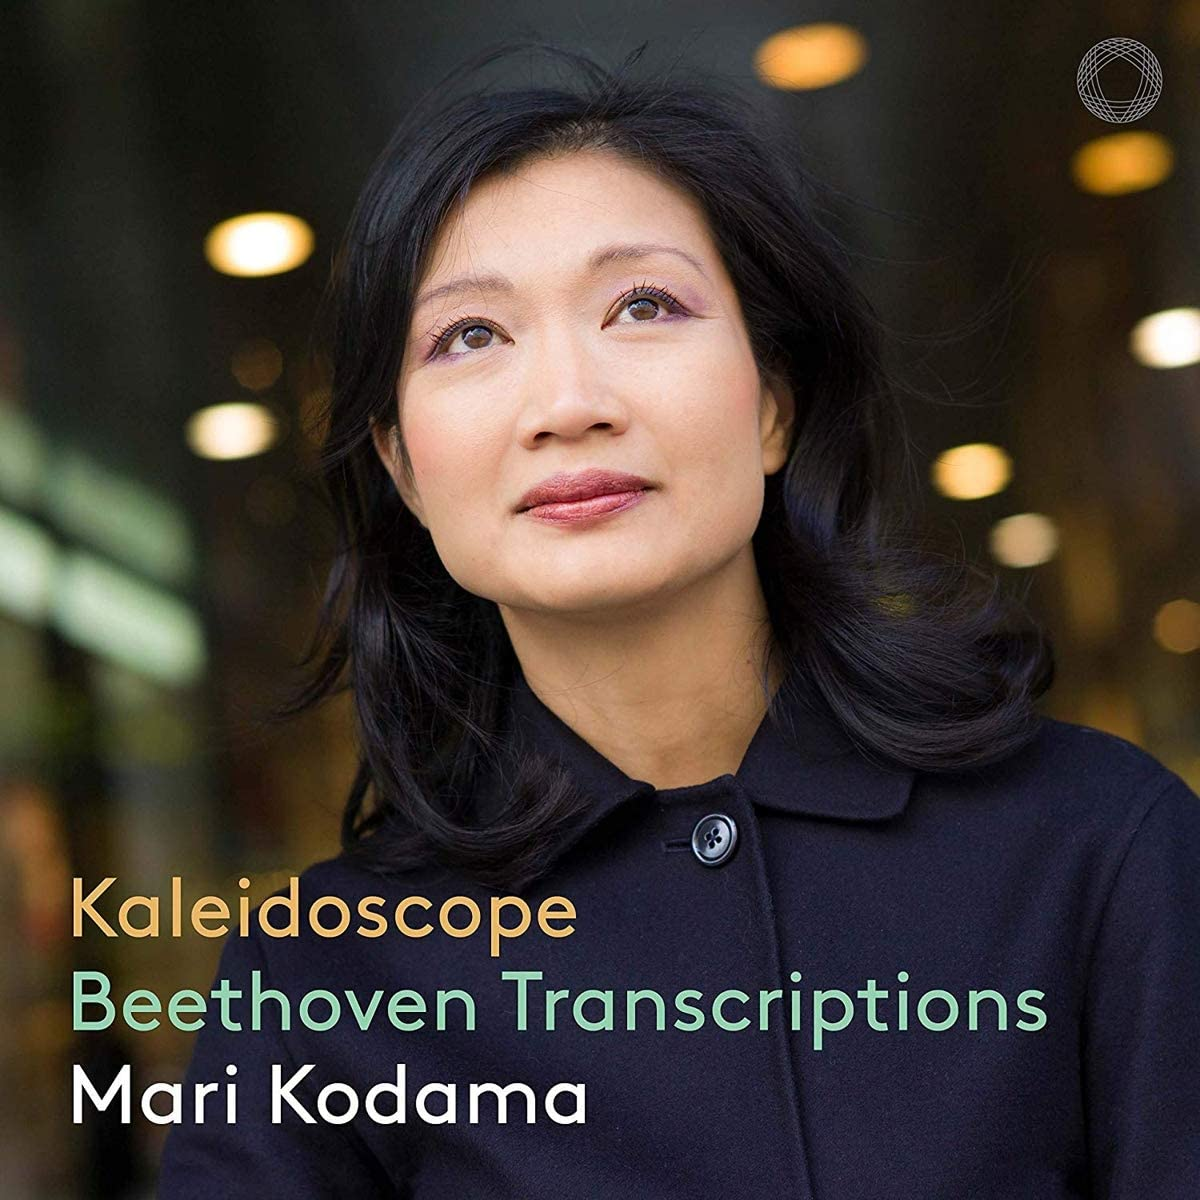 Review of Mari Kodama: Kaleidoscope - Beethoven Transcriptions